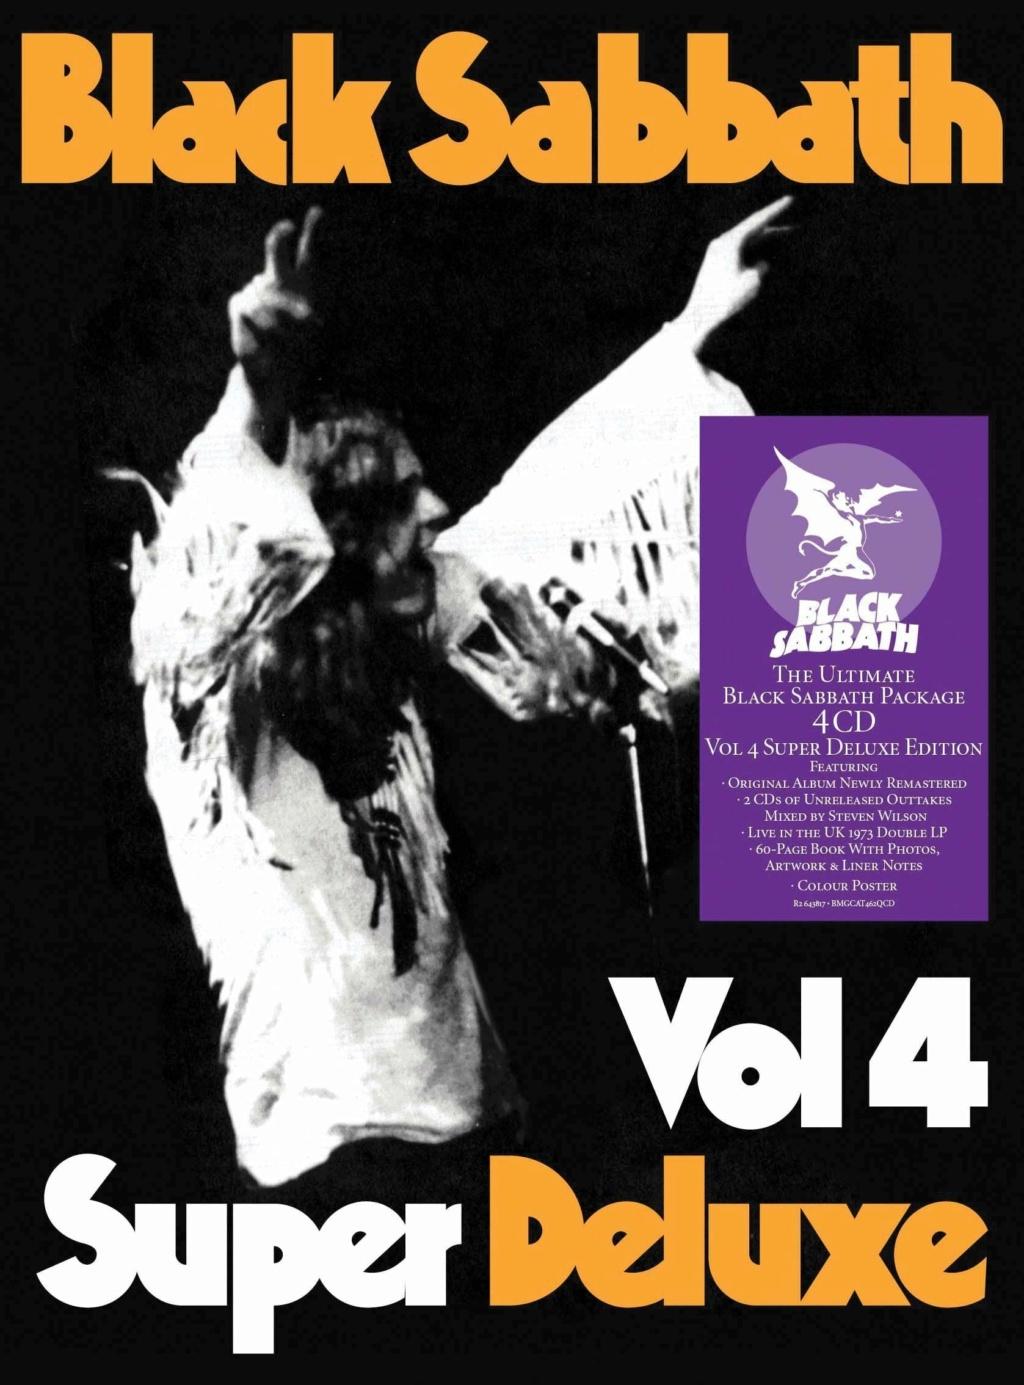 Black Sabbath - Vol. 4 (Super Deluxe Edition) (2021)